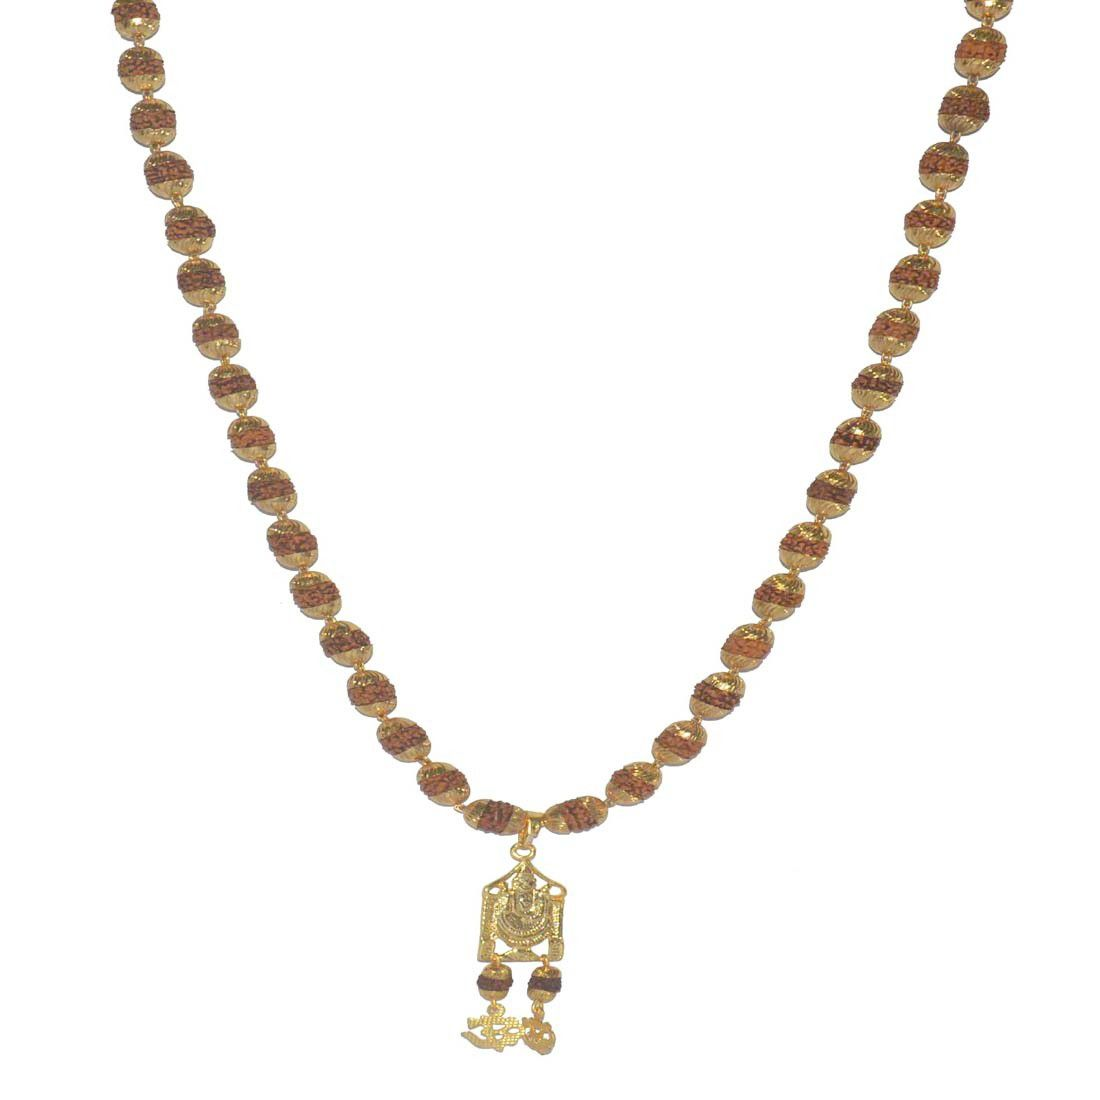 Lord  Tirupati Balaji Religious God Pendant With Rudraksha Mala